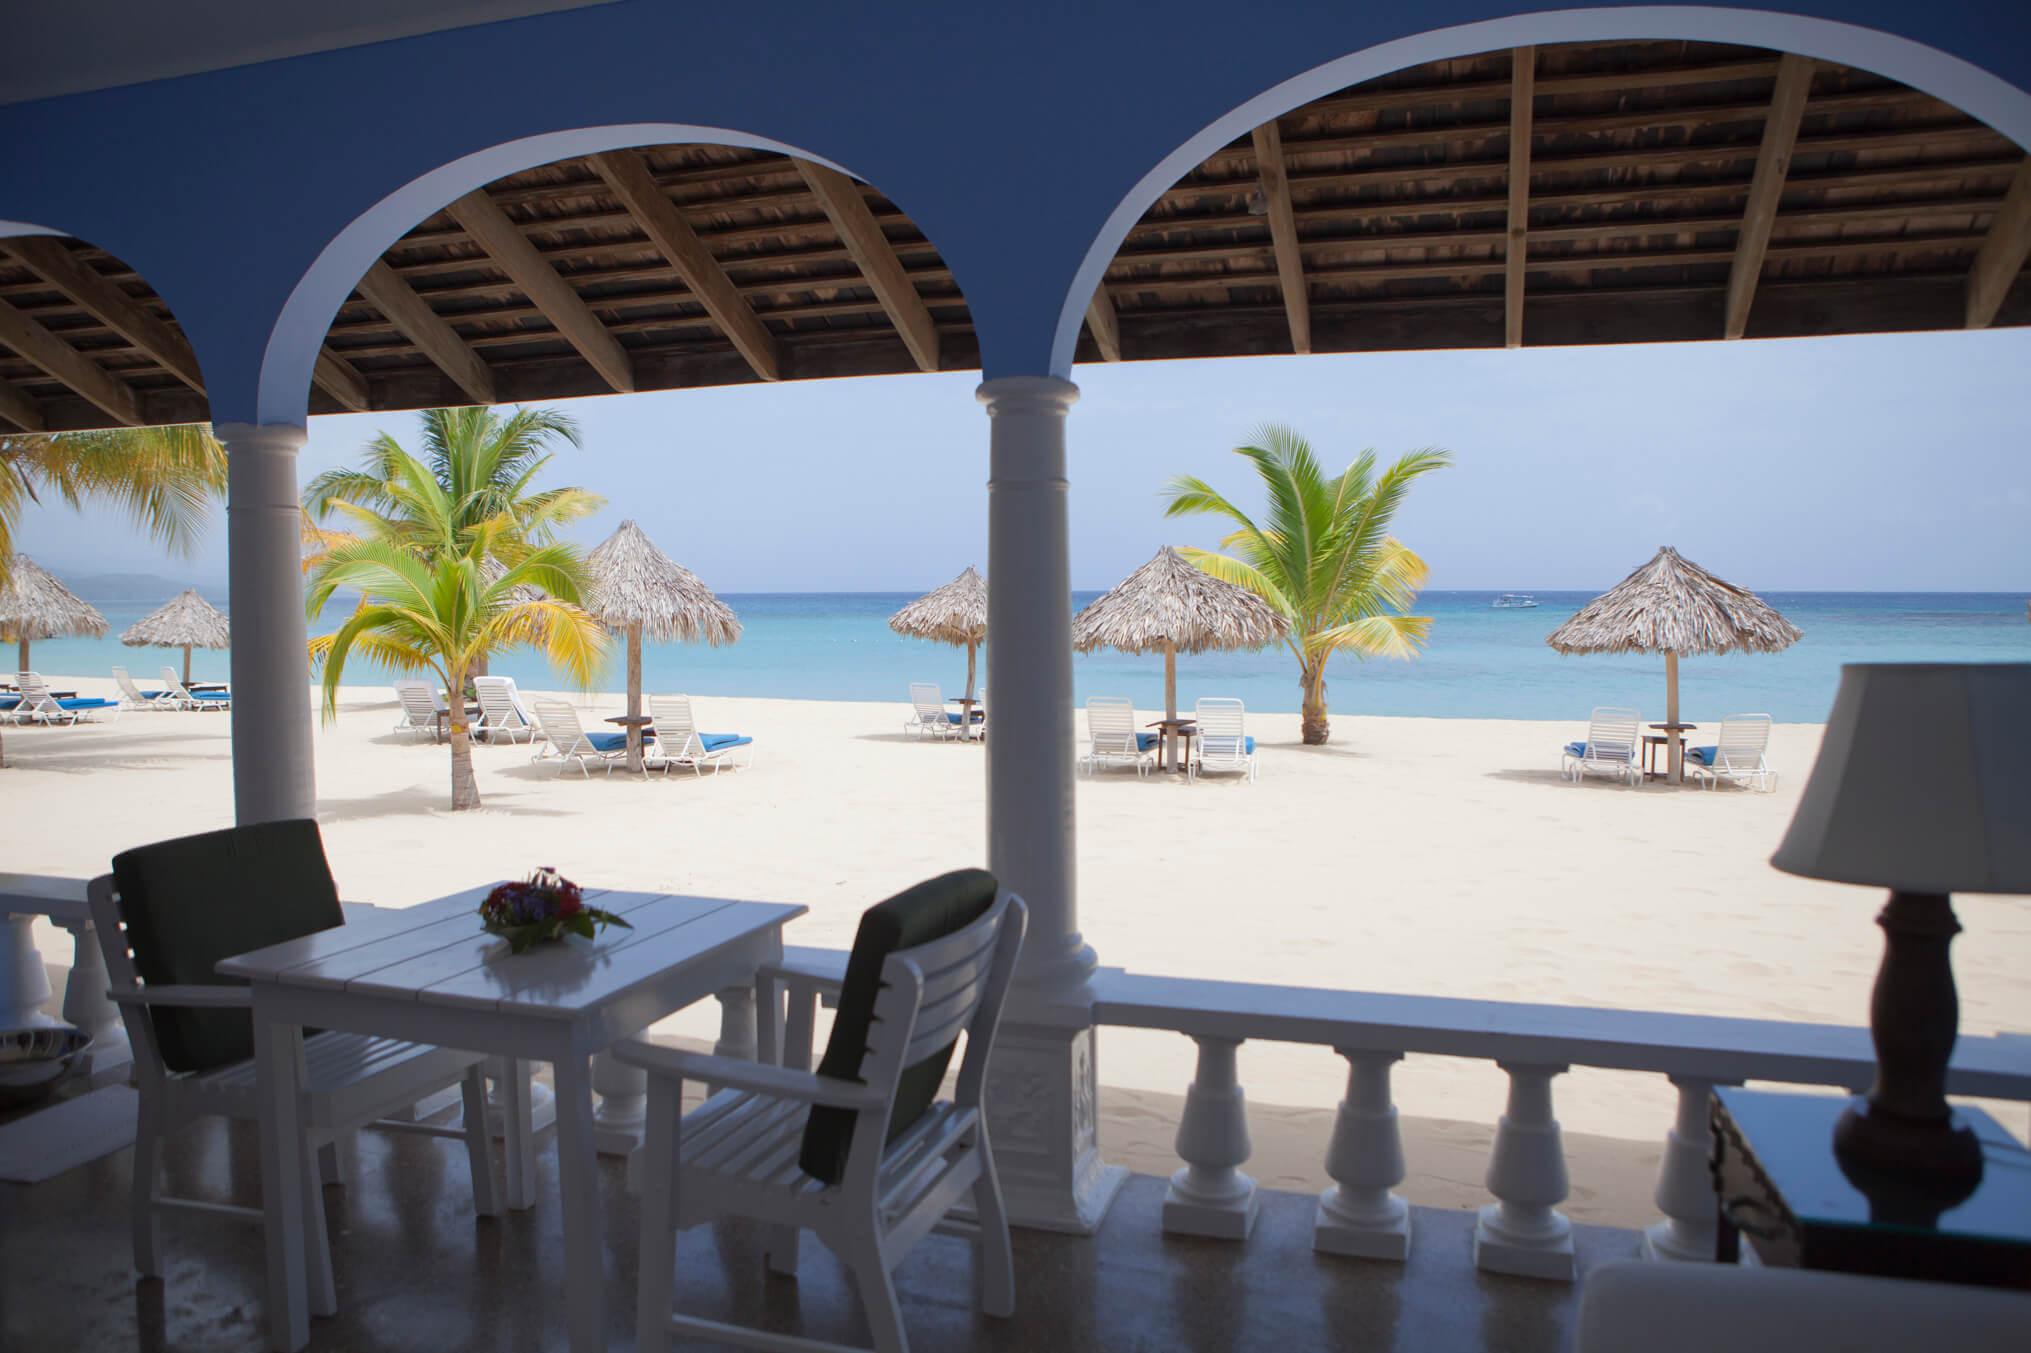 jamaica-inn-13.jpg